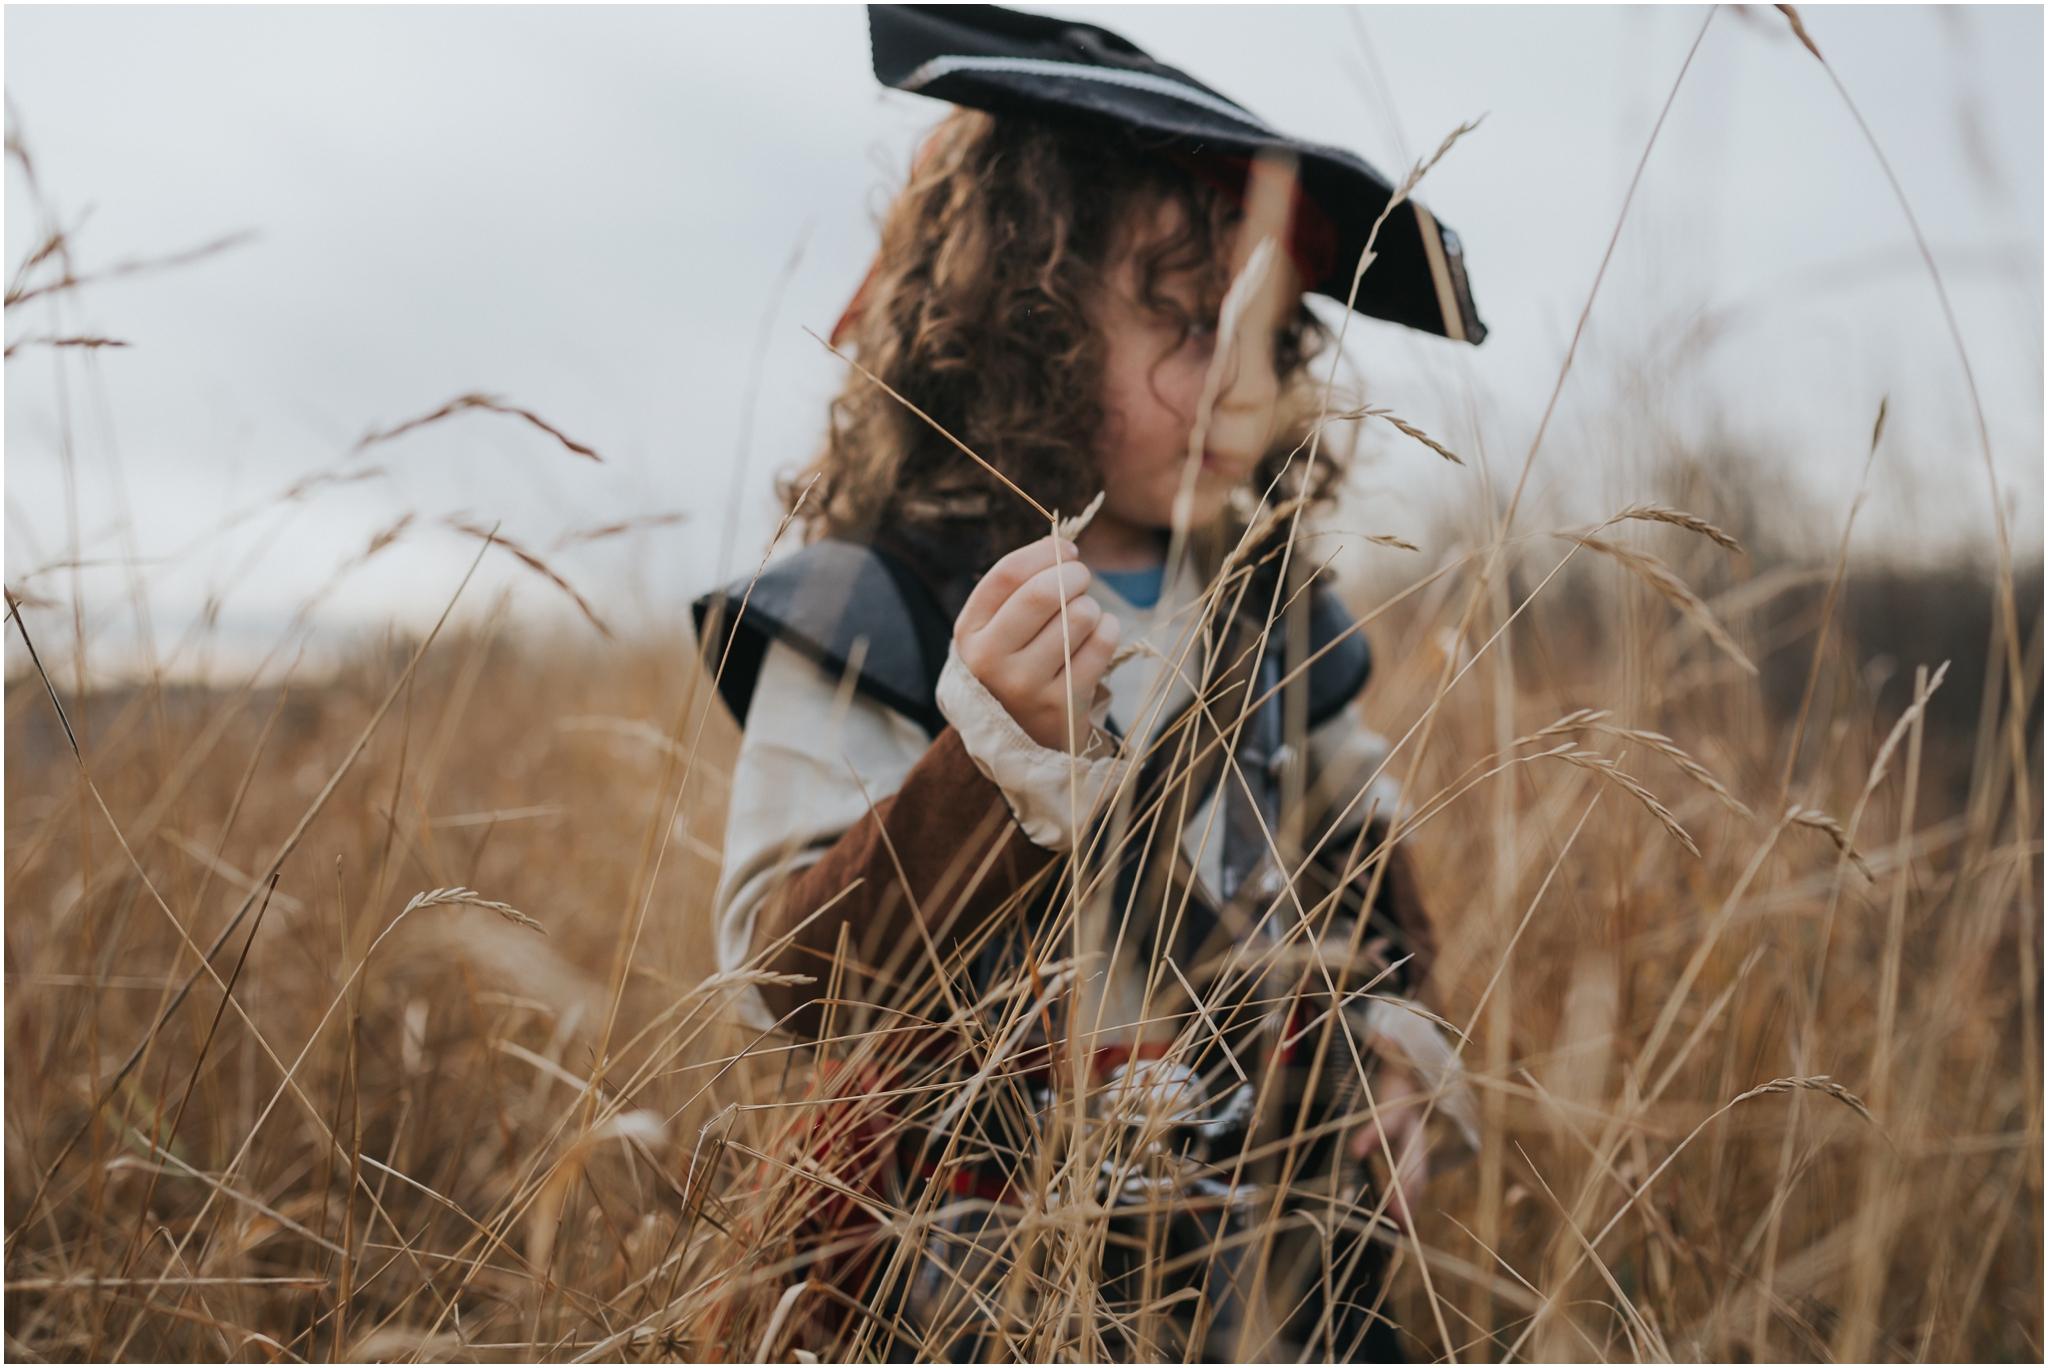 Edmonton Family Lifestyle Photographer - Pirates on a hill - Halloween costume - fall autumn fields